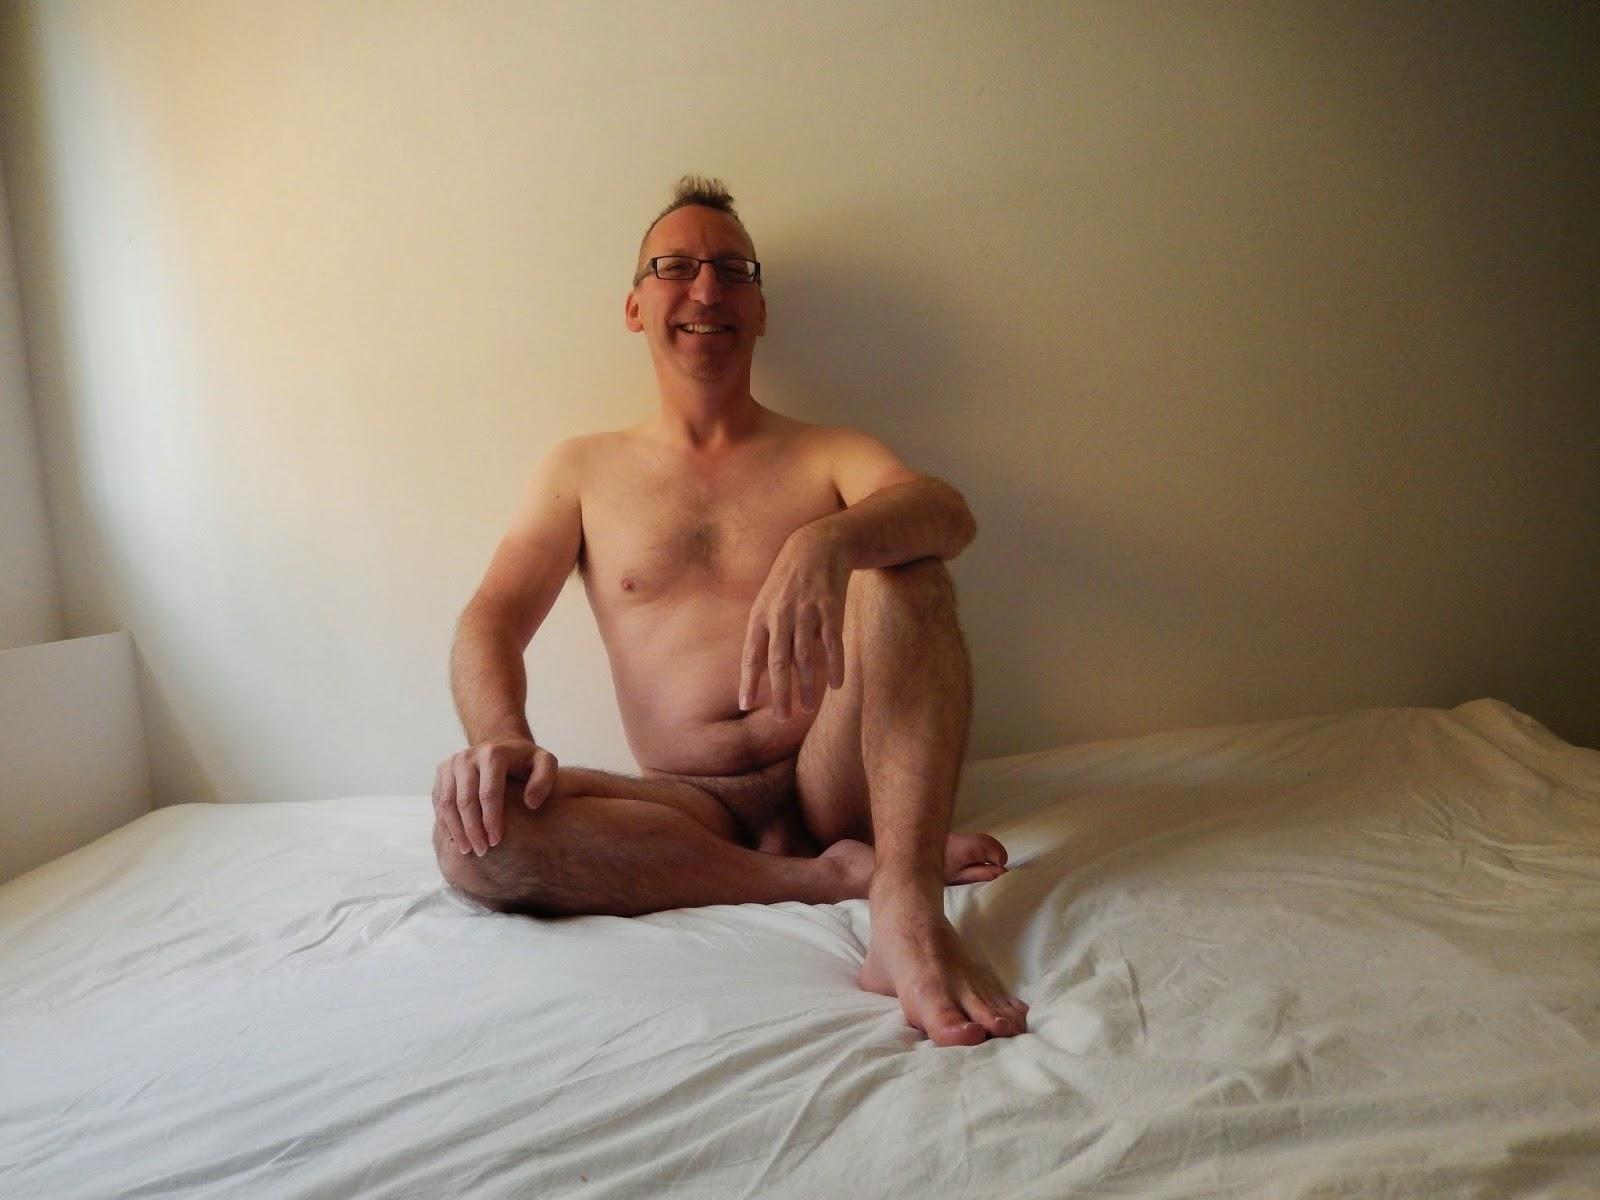 lesbians seduce through massage